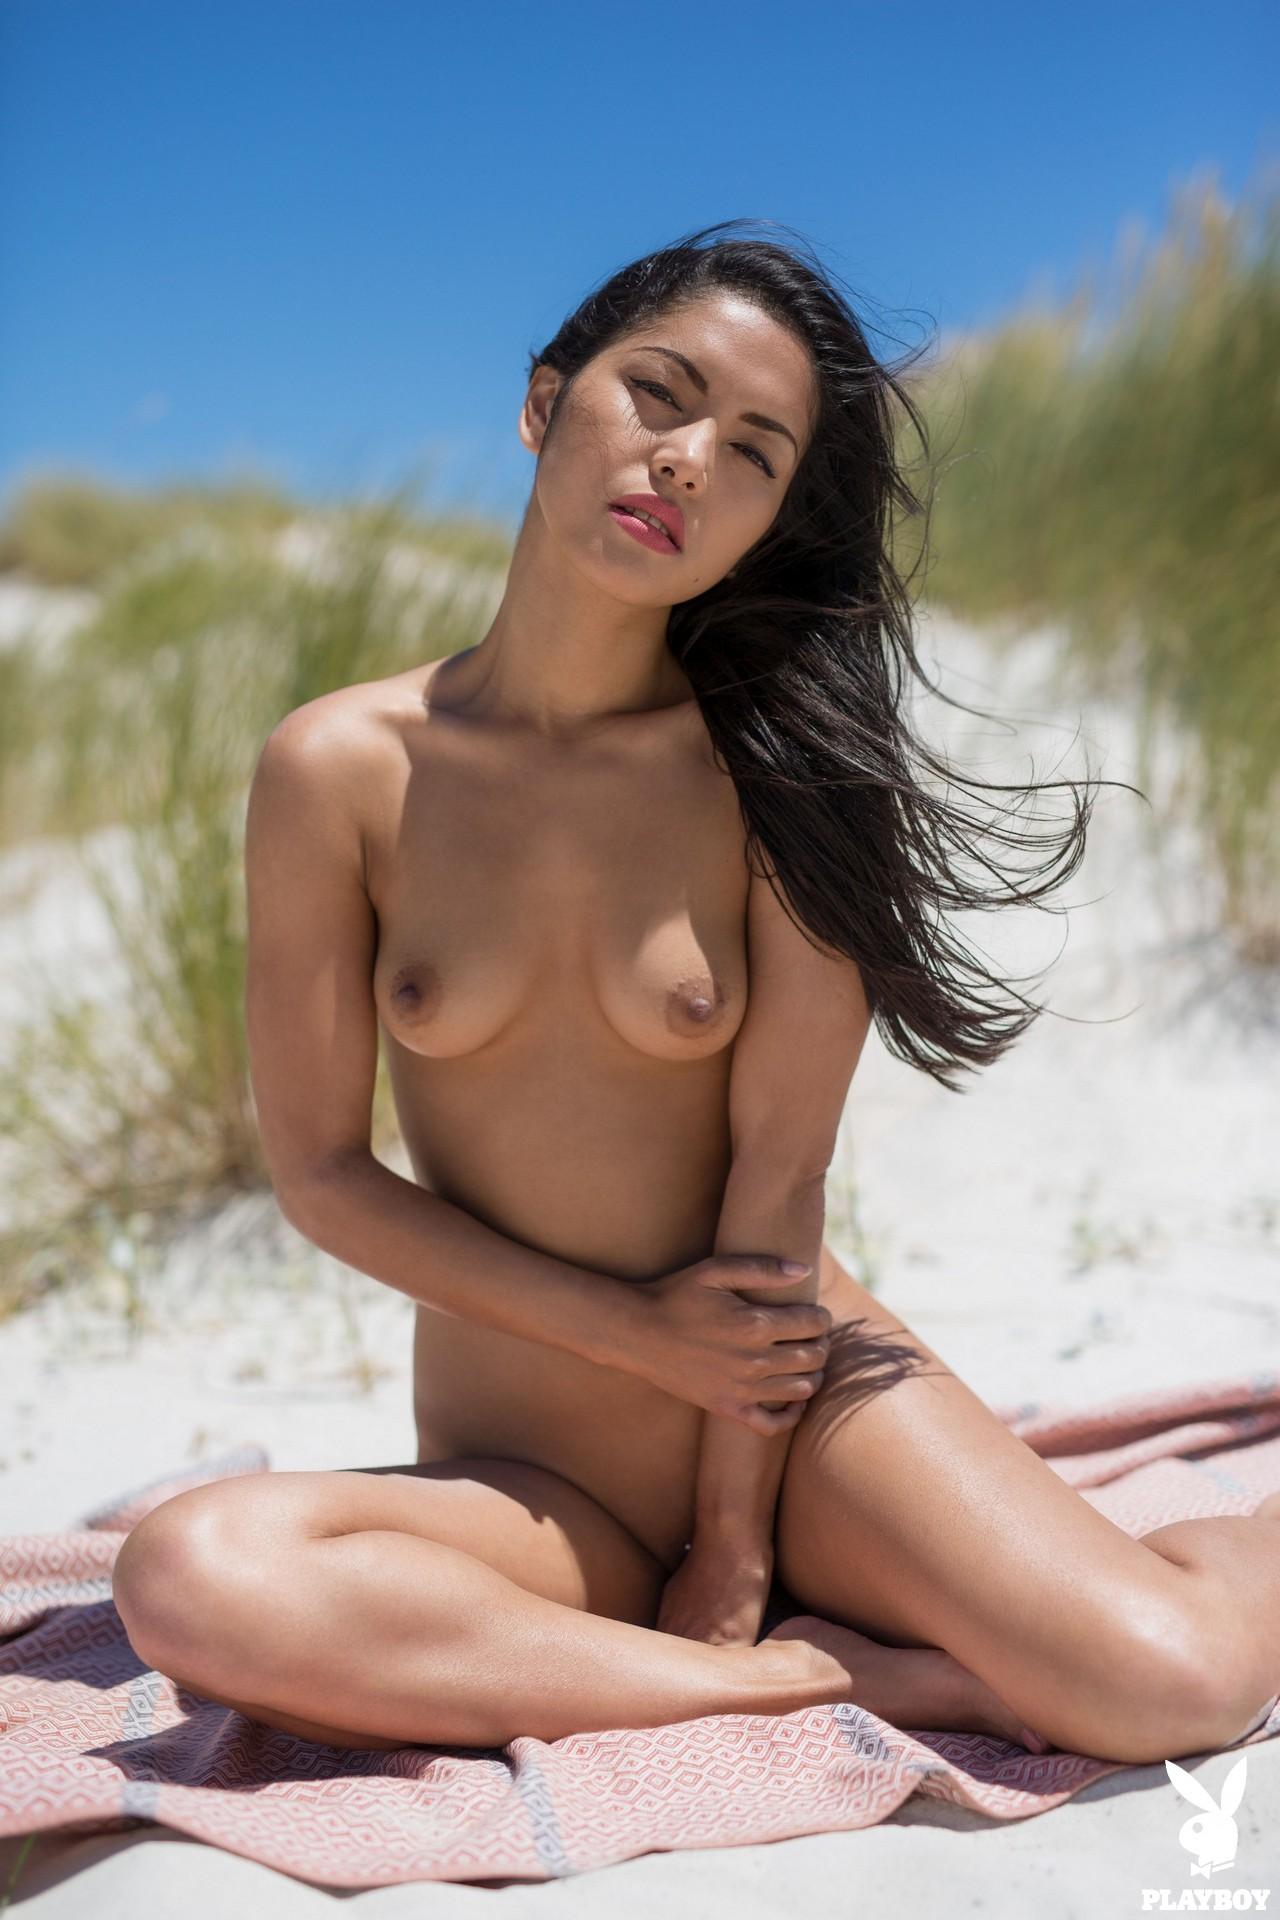 Chloe Rose in  Breezy Paradise - Playboy Plus 12